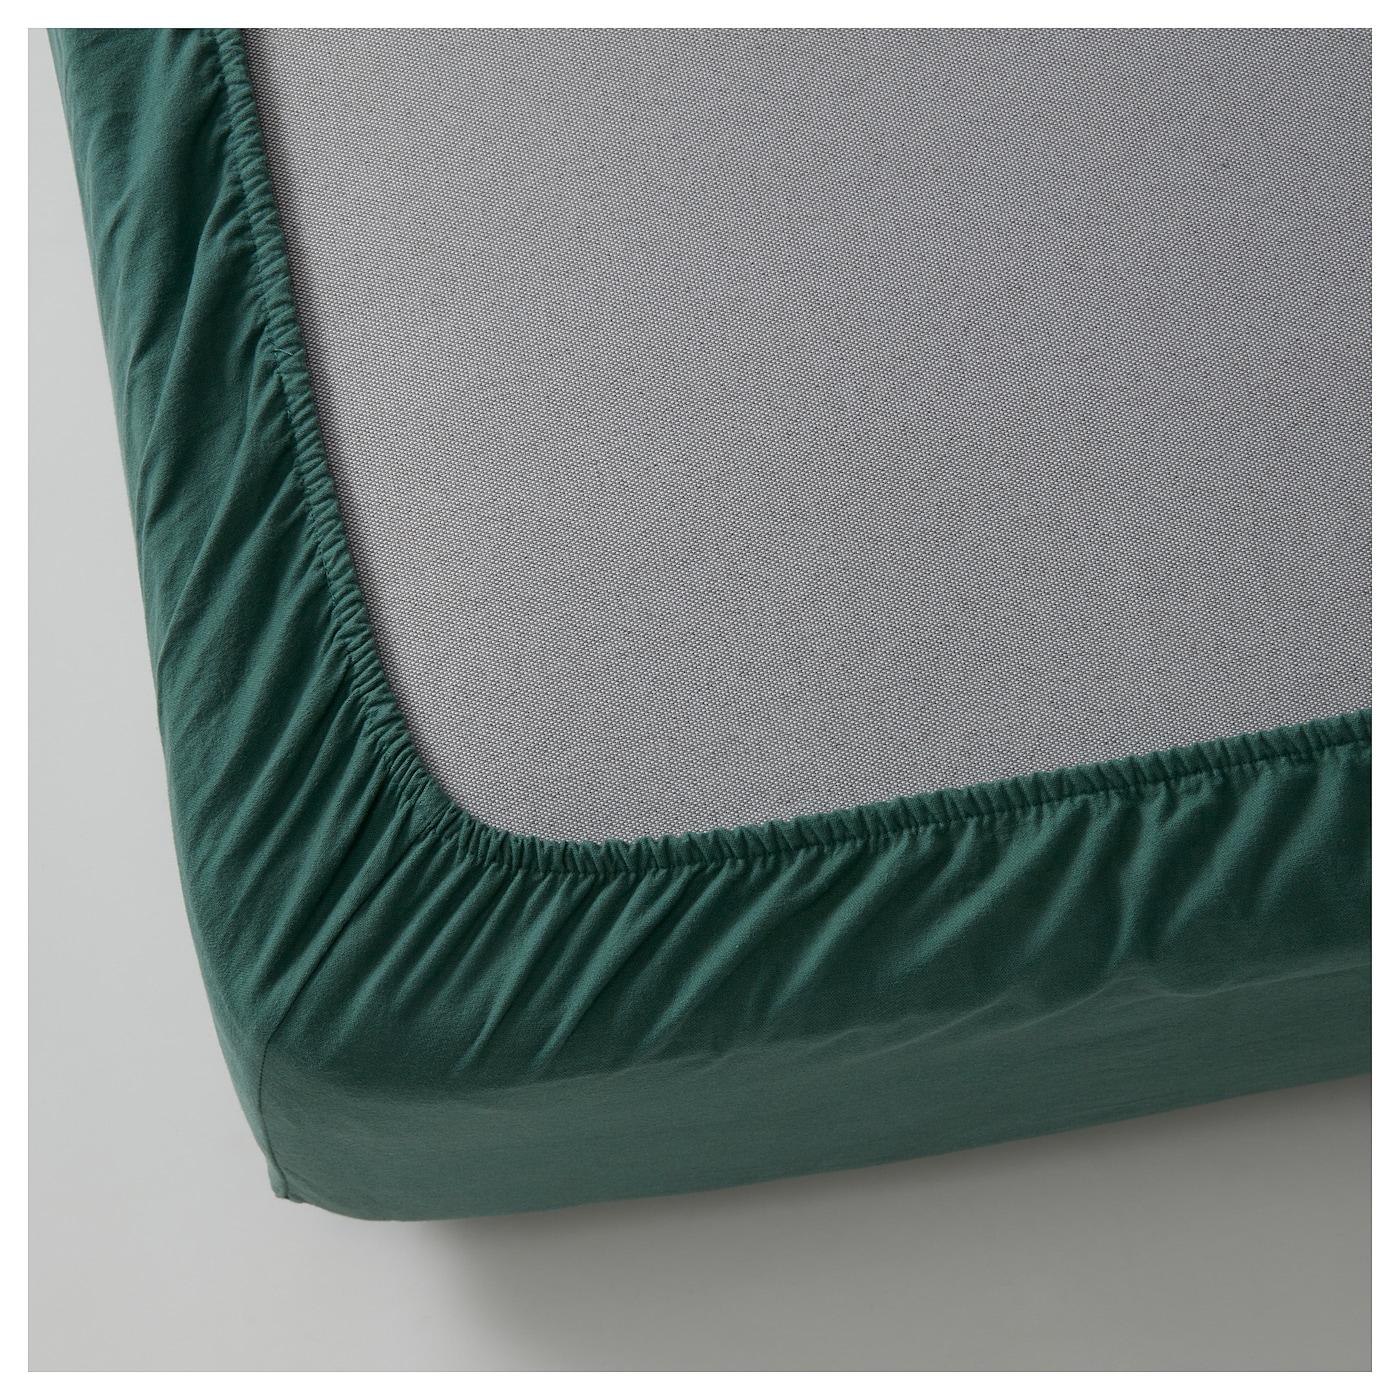 bl suga drap housse vert 160x200 cm ikea. Black Bedroom Furniture Sets. Home Design Ideas